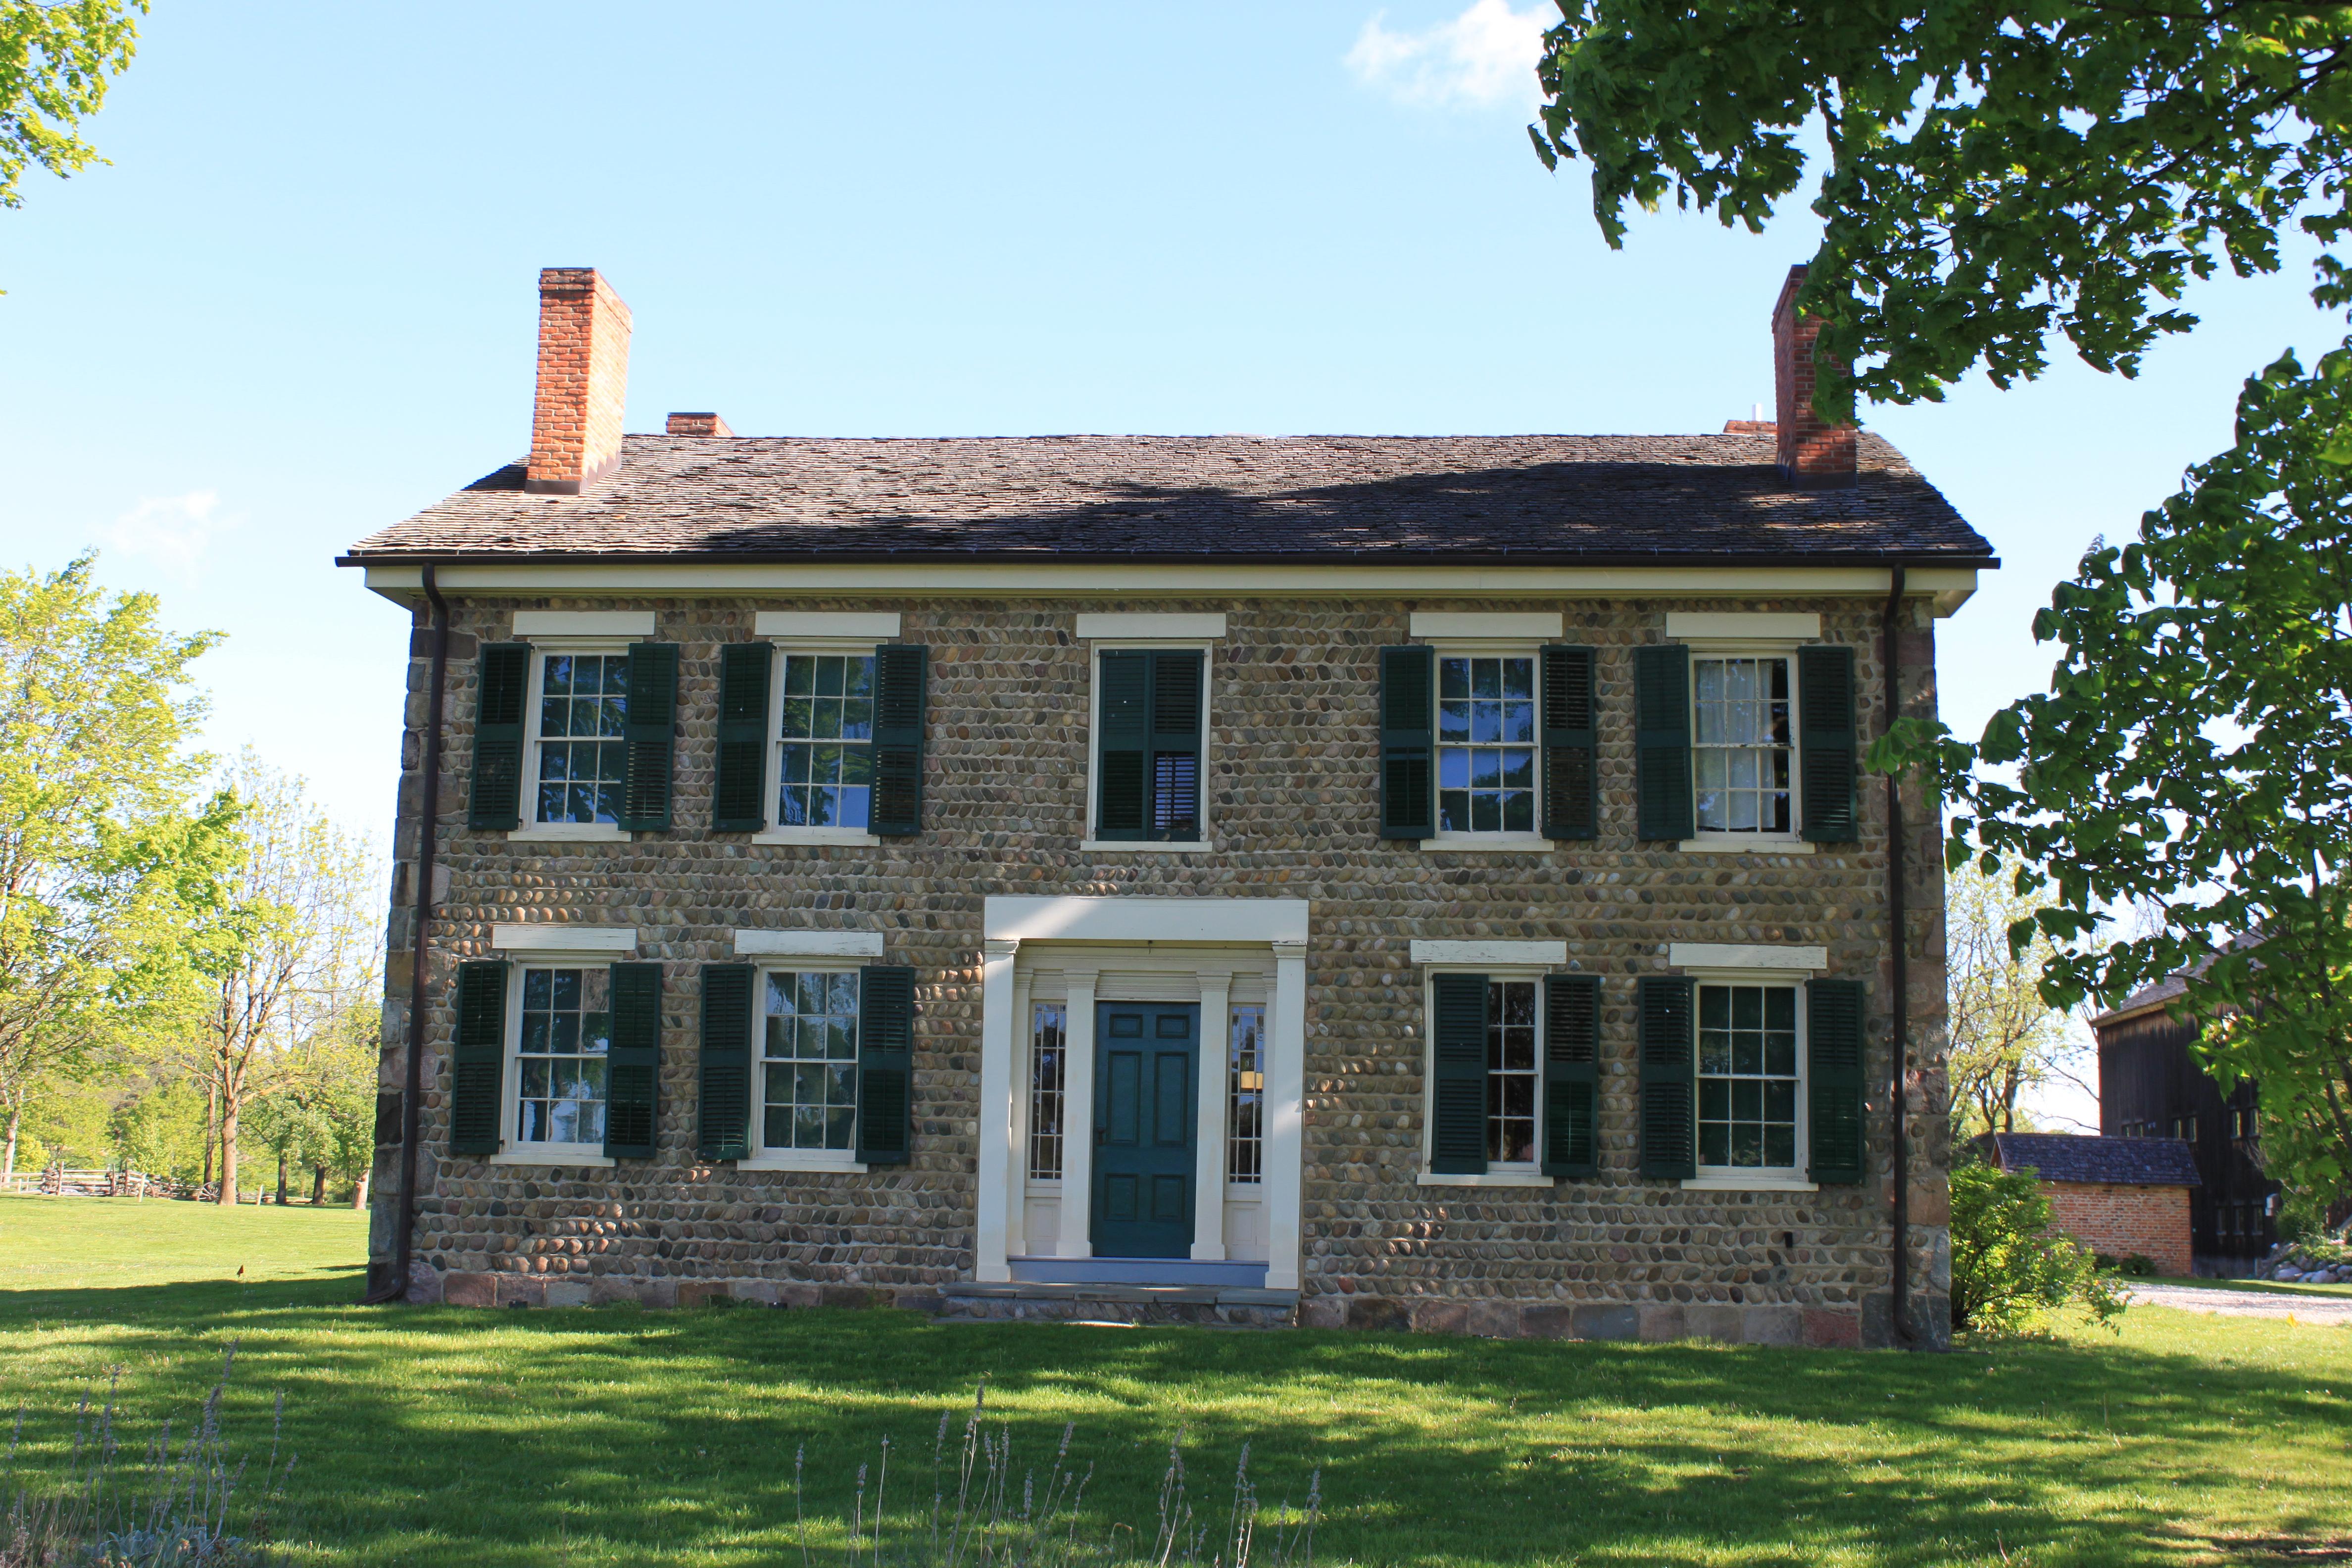 File:Cobblestone Farm Ticknor House.JPG - Wikipedia, the free ...